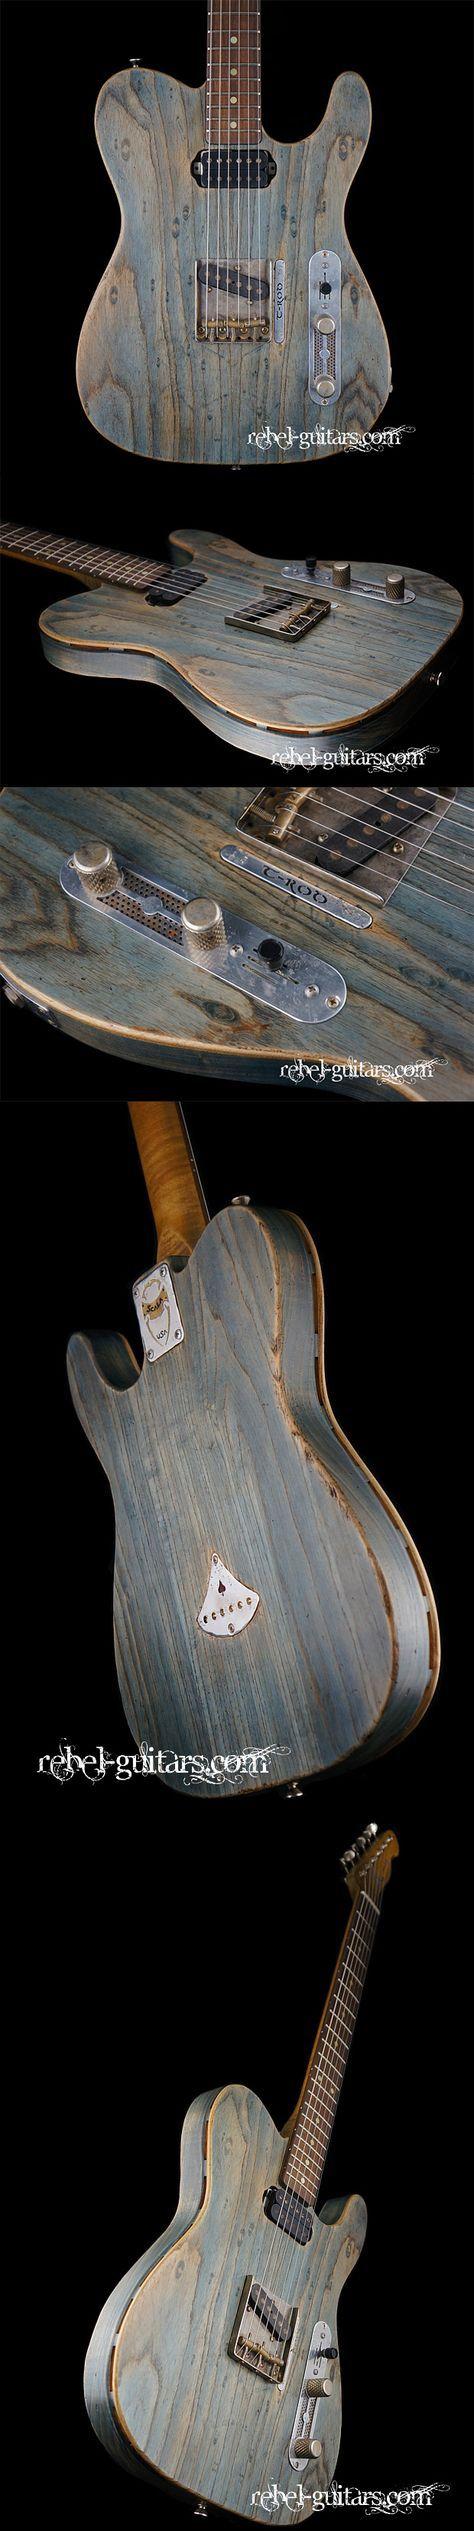 Scala Guitars T-Rod Prototype in Worn Denim. More at: http://rebel-guitars.com/scala-guitars-t-rod-prototype-in-worn-denim/